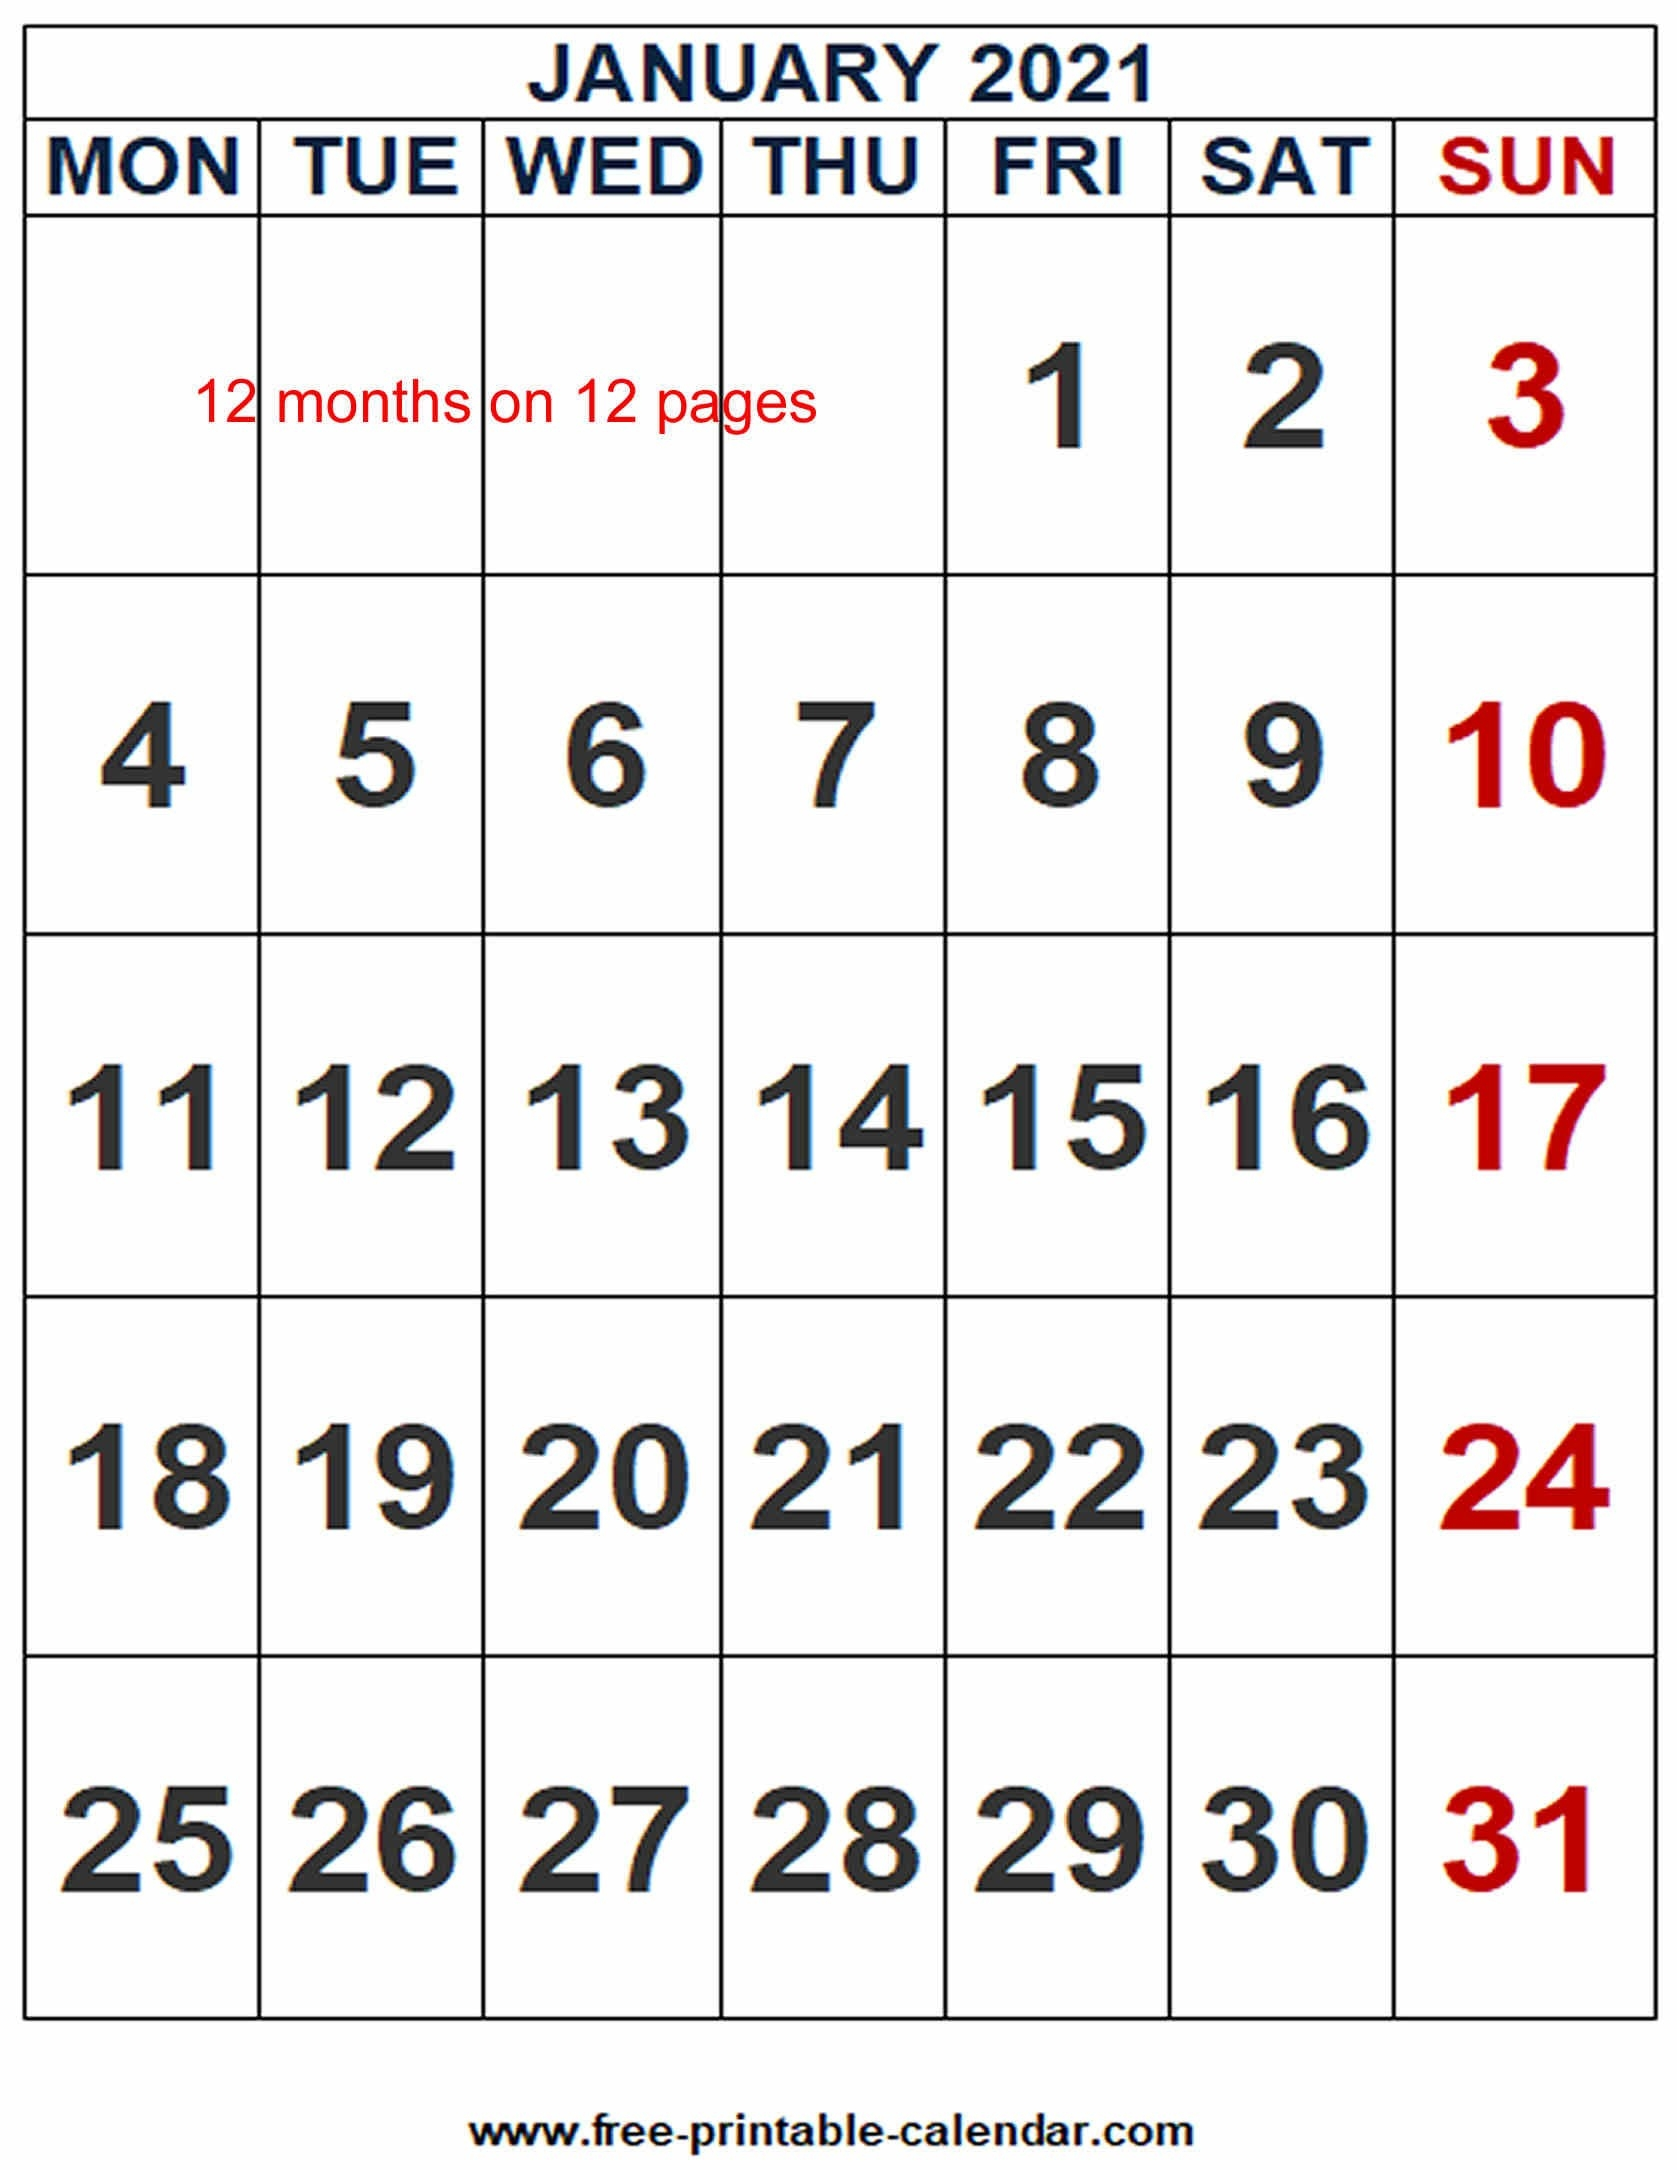 2021 Calendar Word Template - Free-Printable-Calendar-Edit October 2021 Ms Word